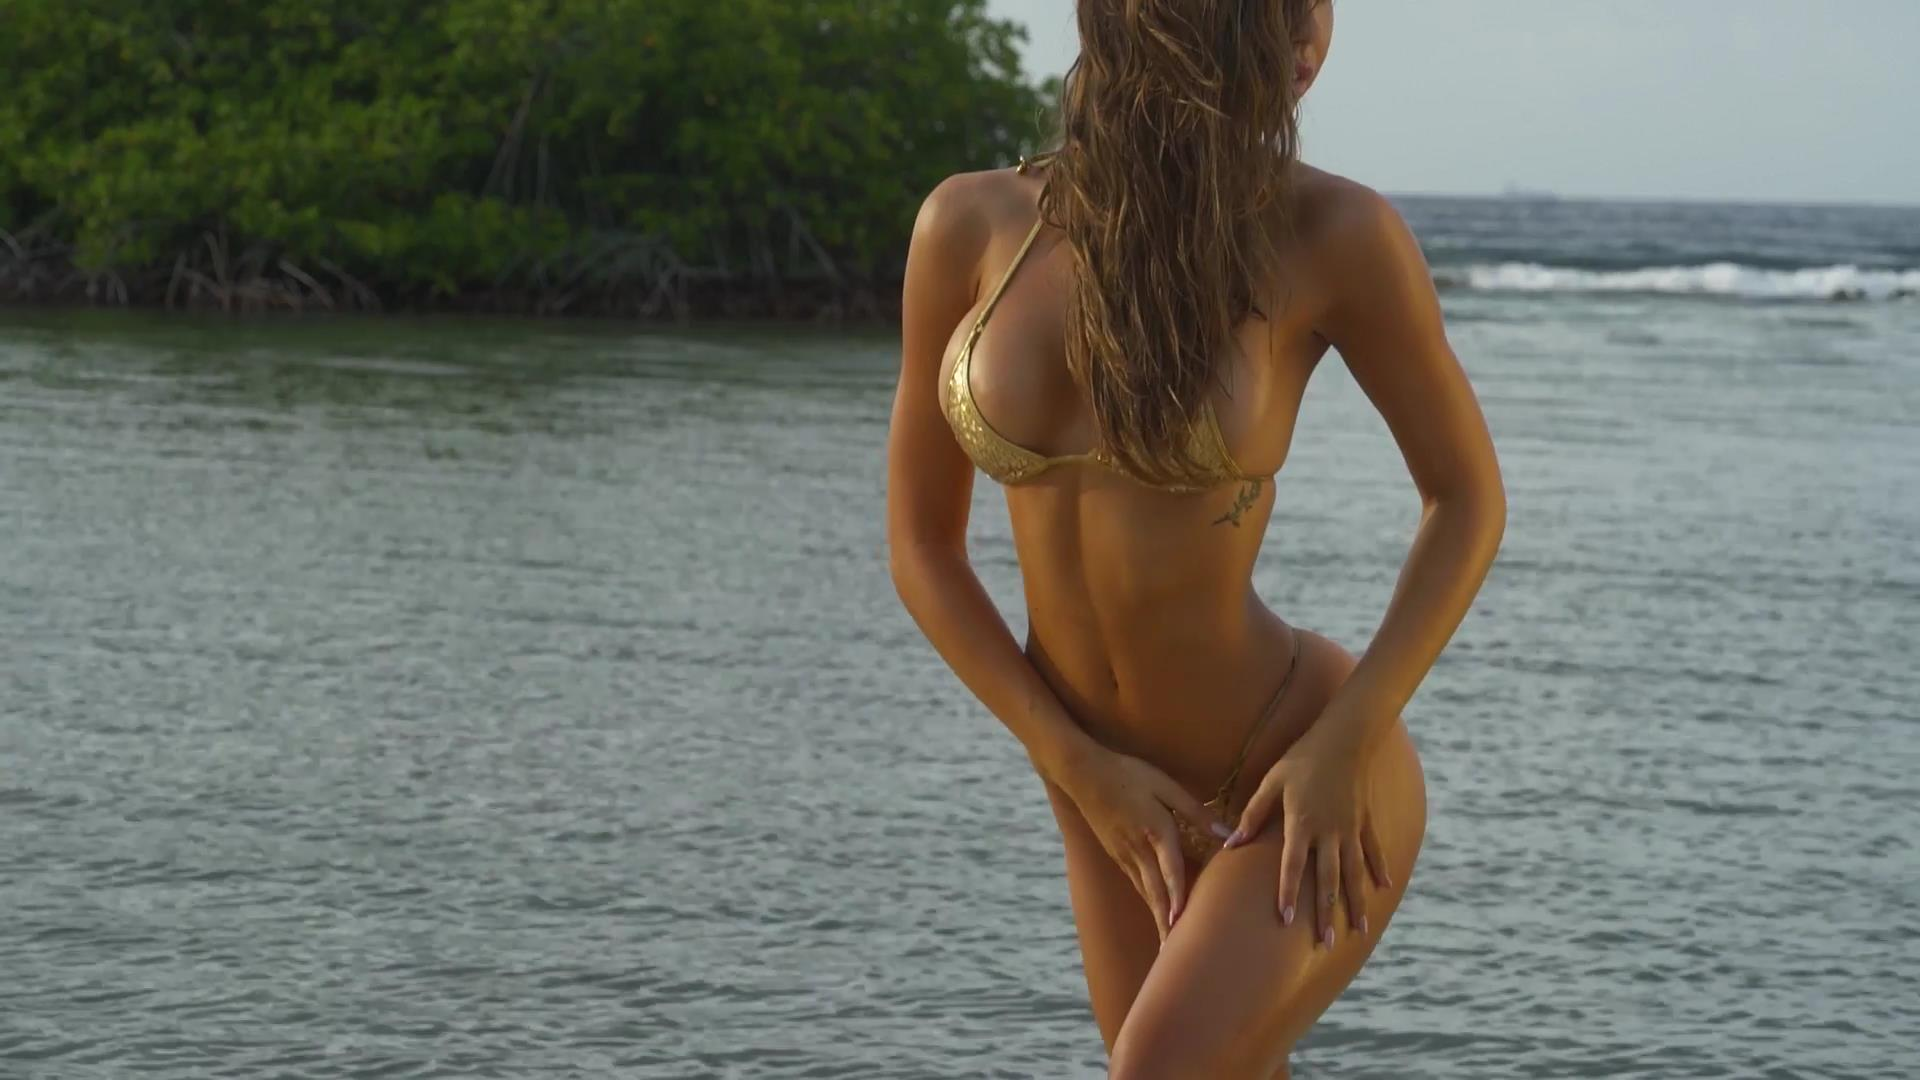 Alexis Ren desnuda sin censura 2